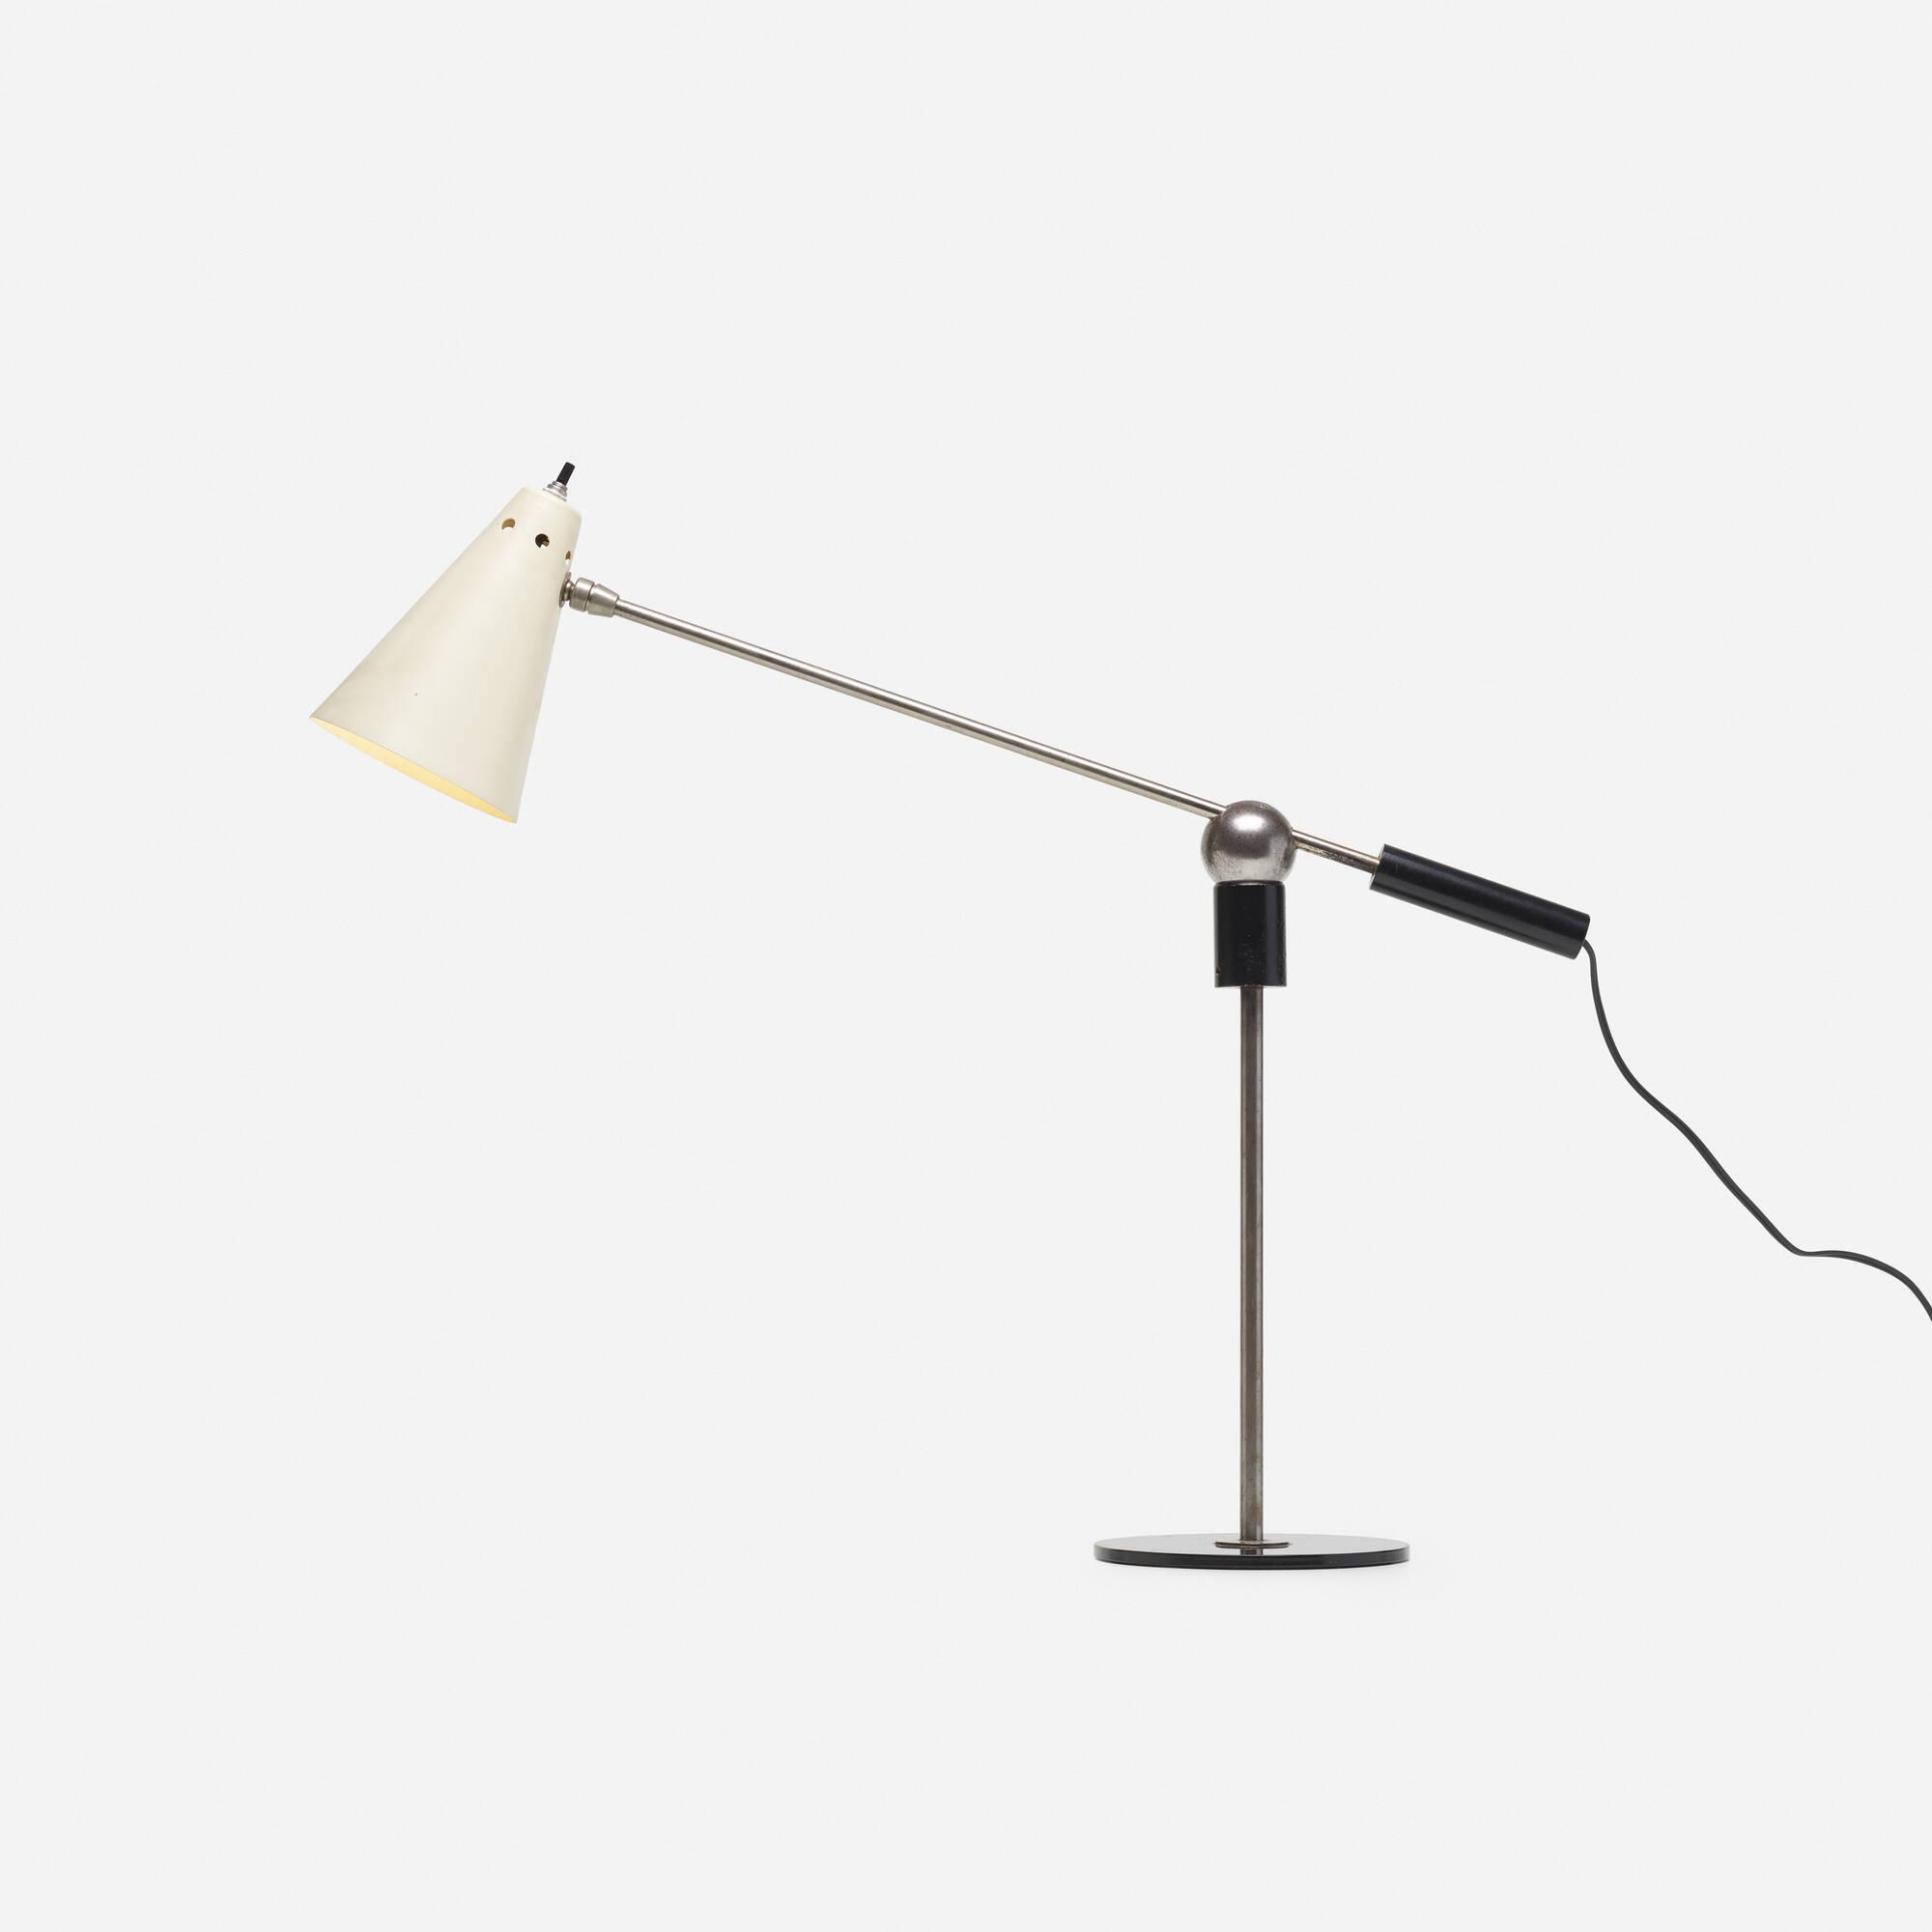 383: Gilbert Watrous / table lamp (1 of 3)